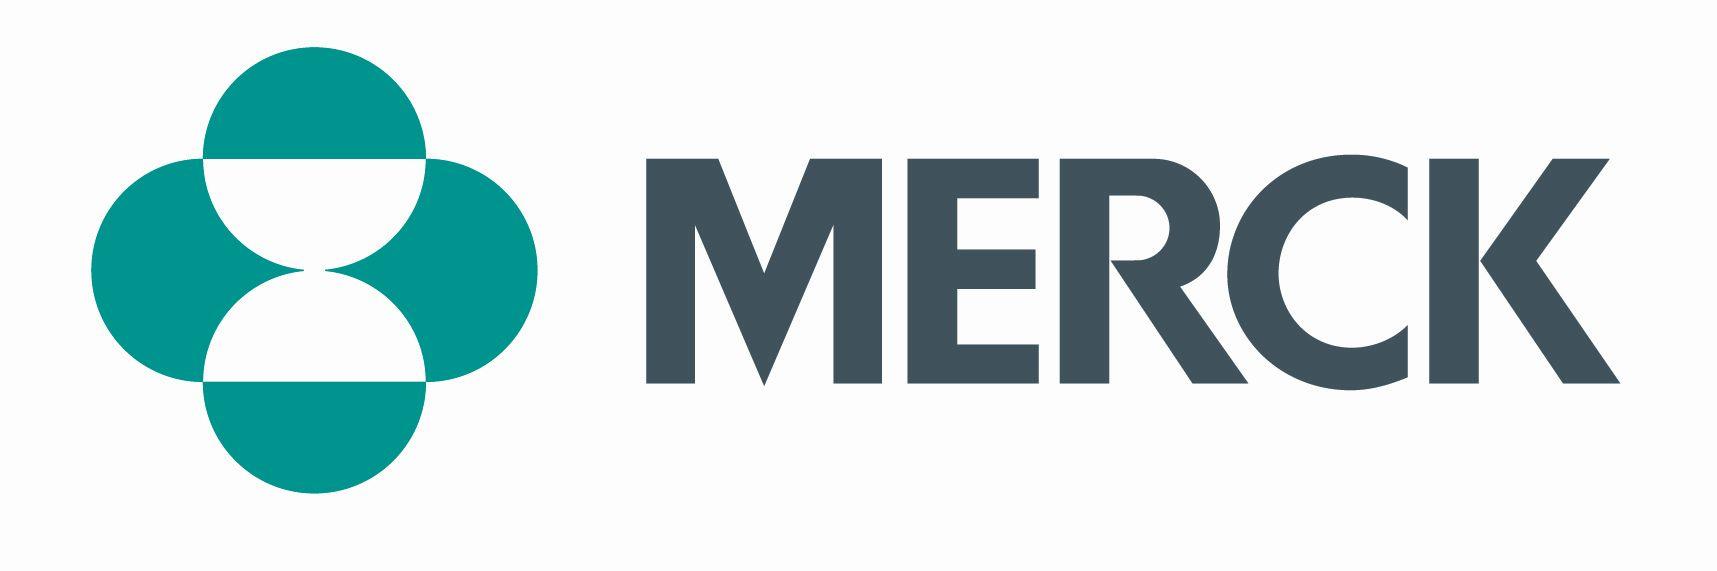 Merck [Converted] copy.jpg